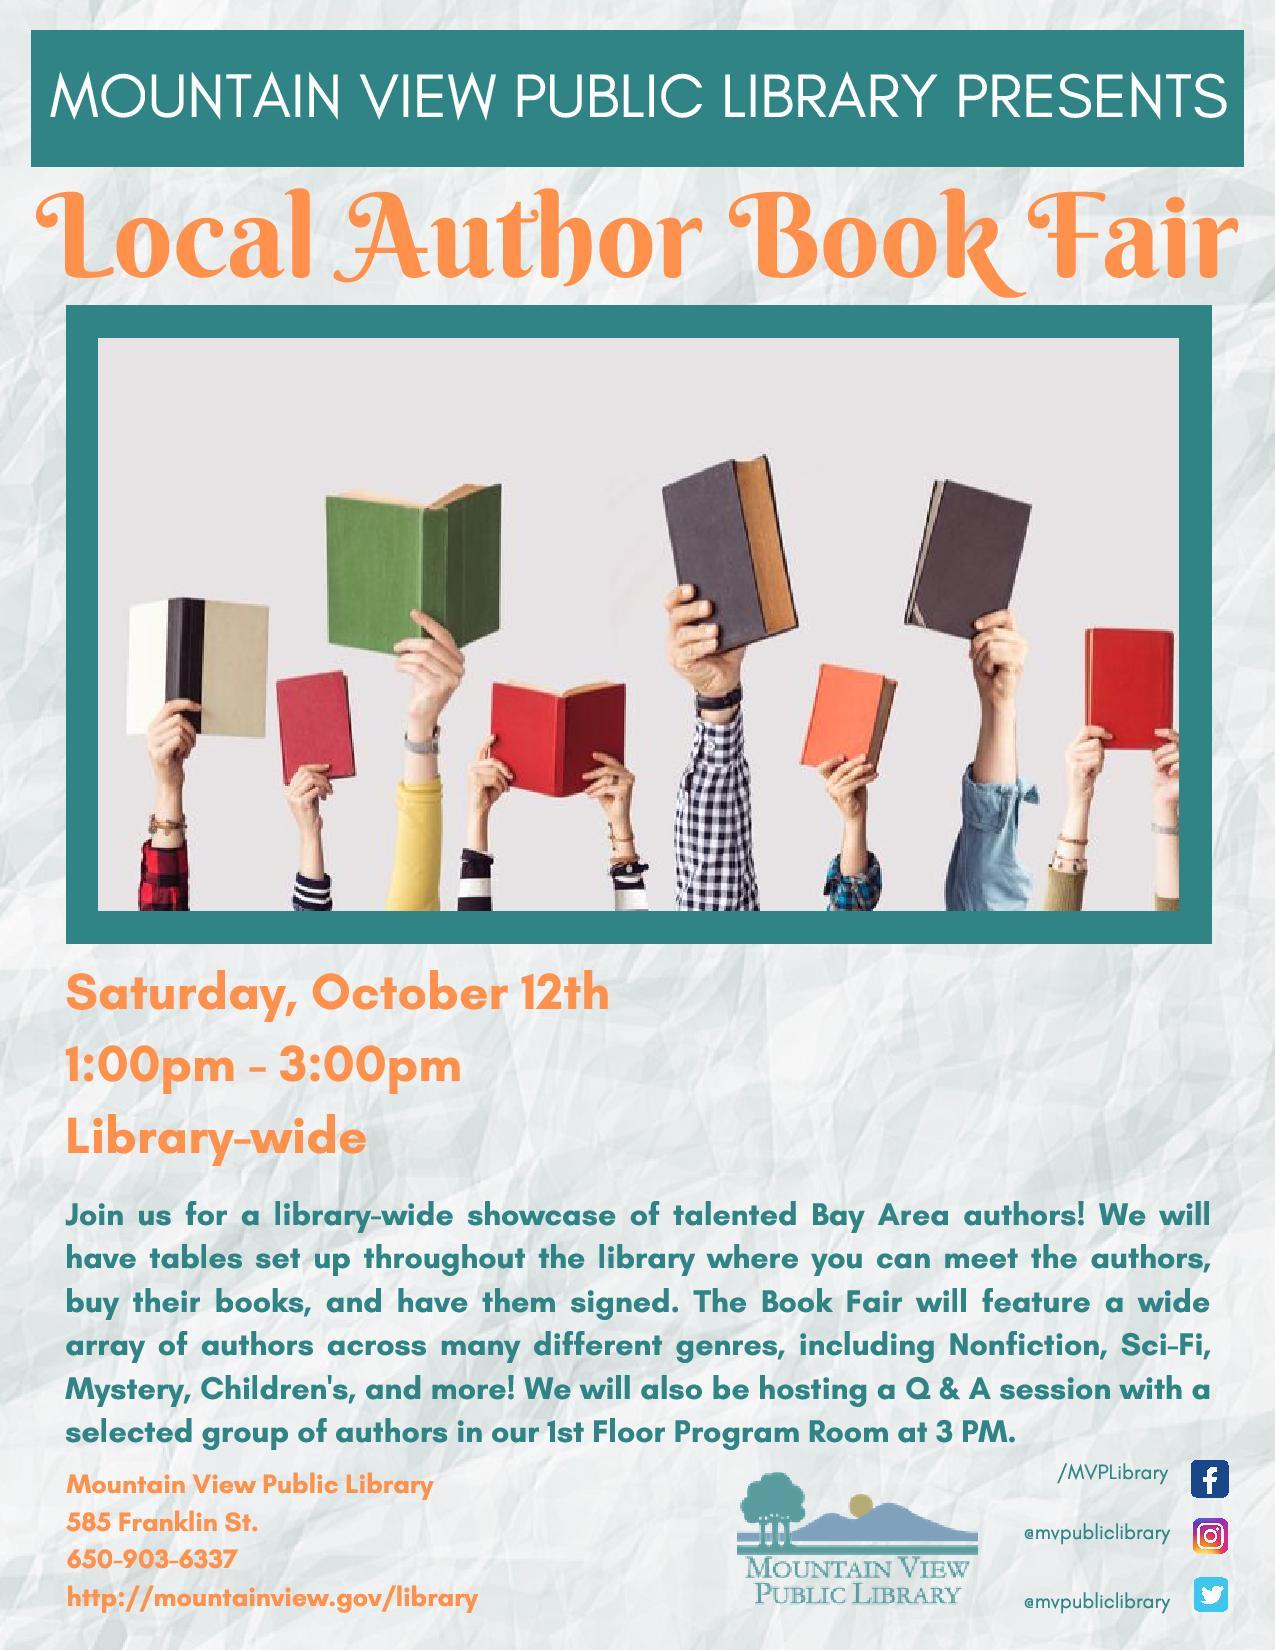 Local Author Book Fair